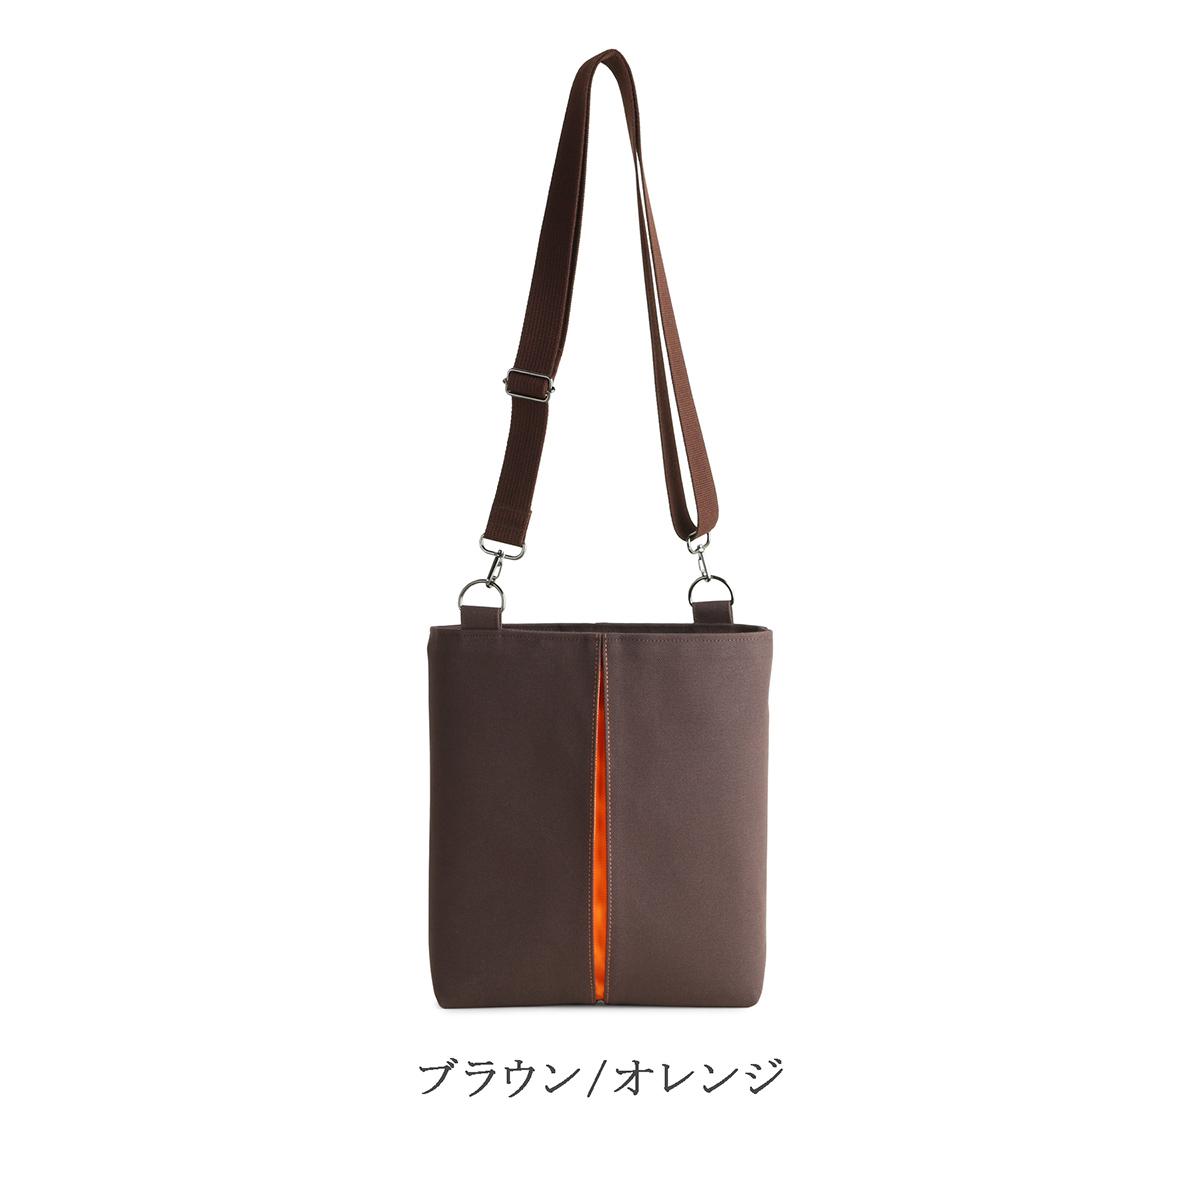 KOSHO ougi pleats 帆布 ポシェット